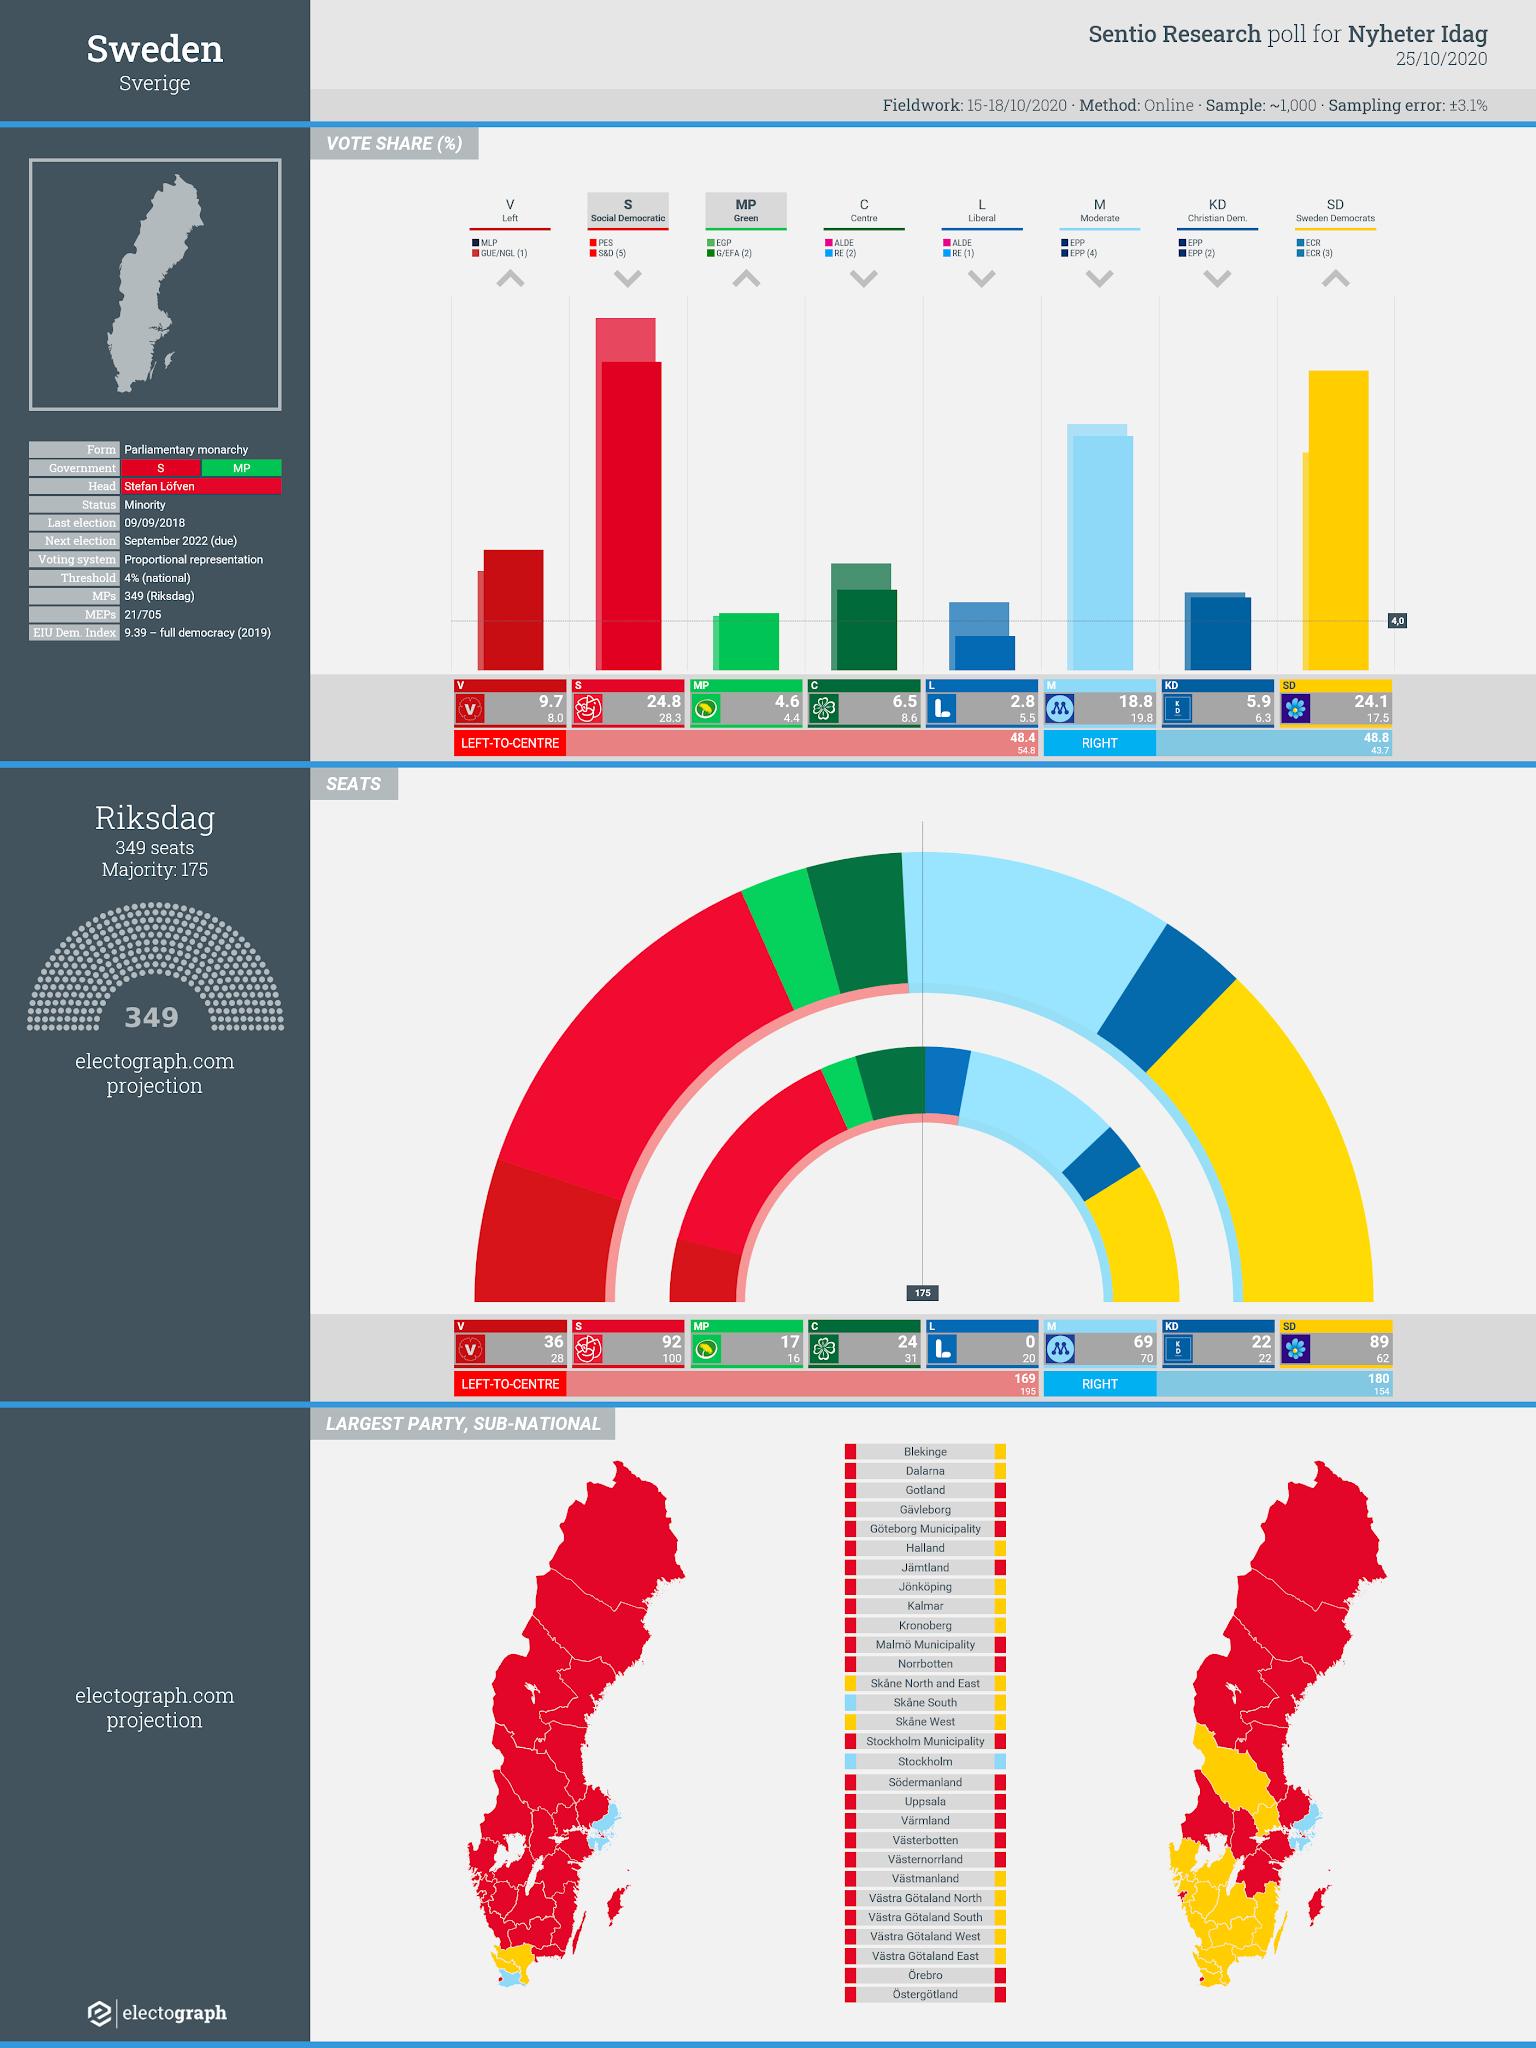 SWEDEN: Sentio Research poll chart for Nyheter Idag, 25 October 2020